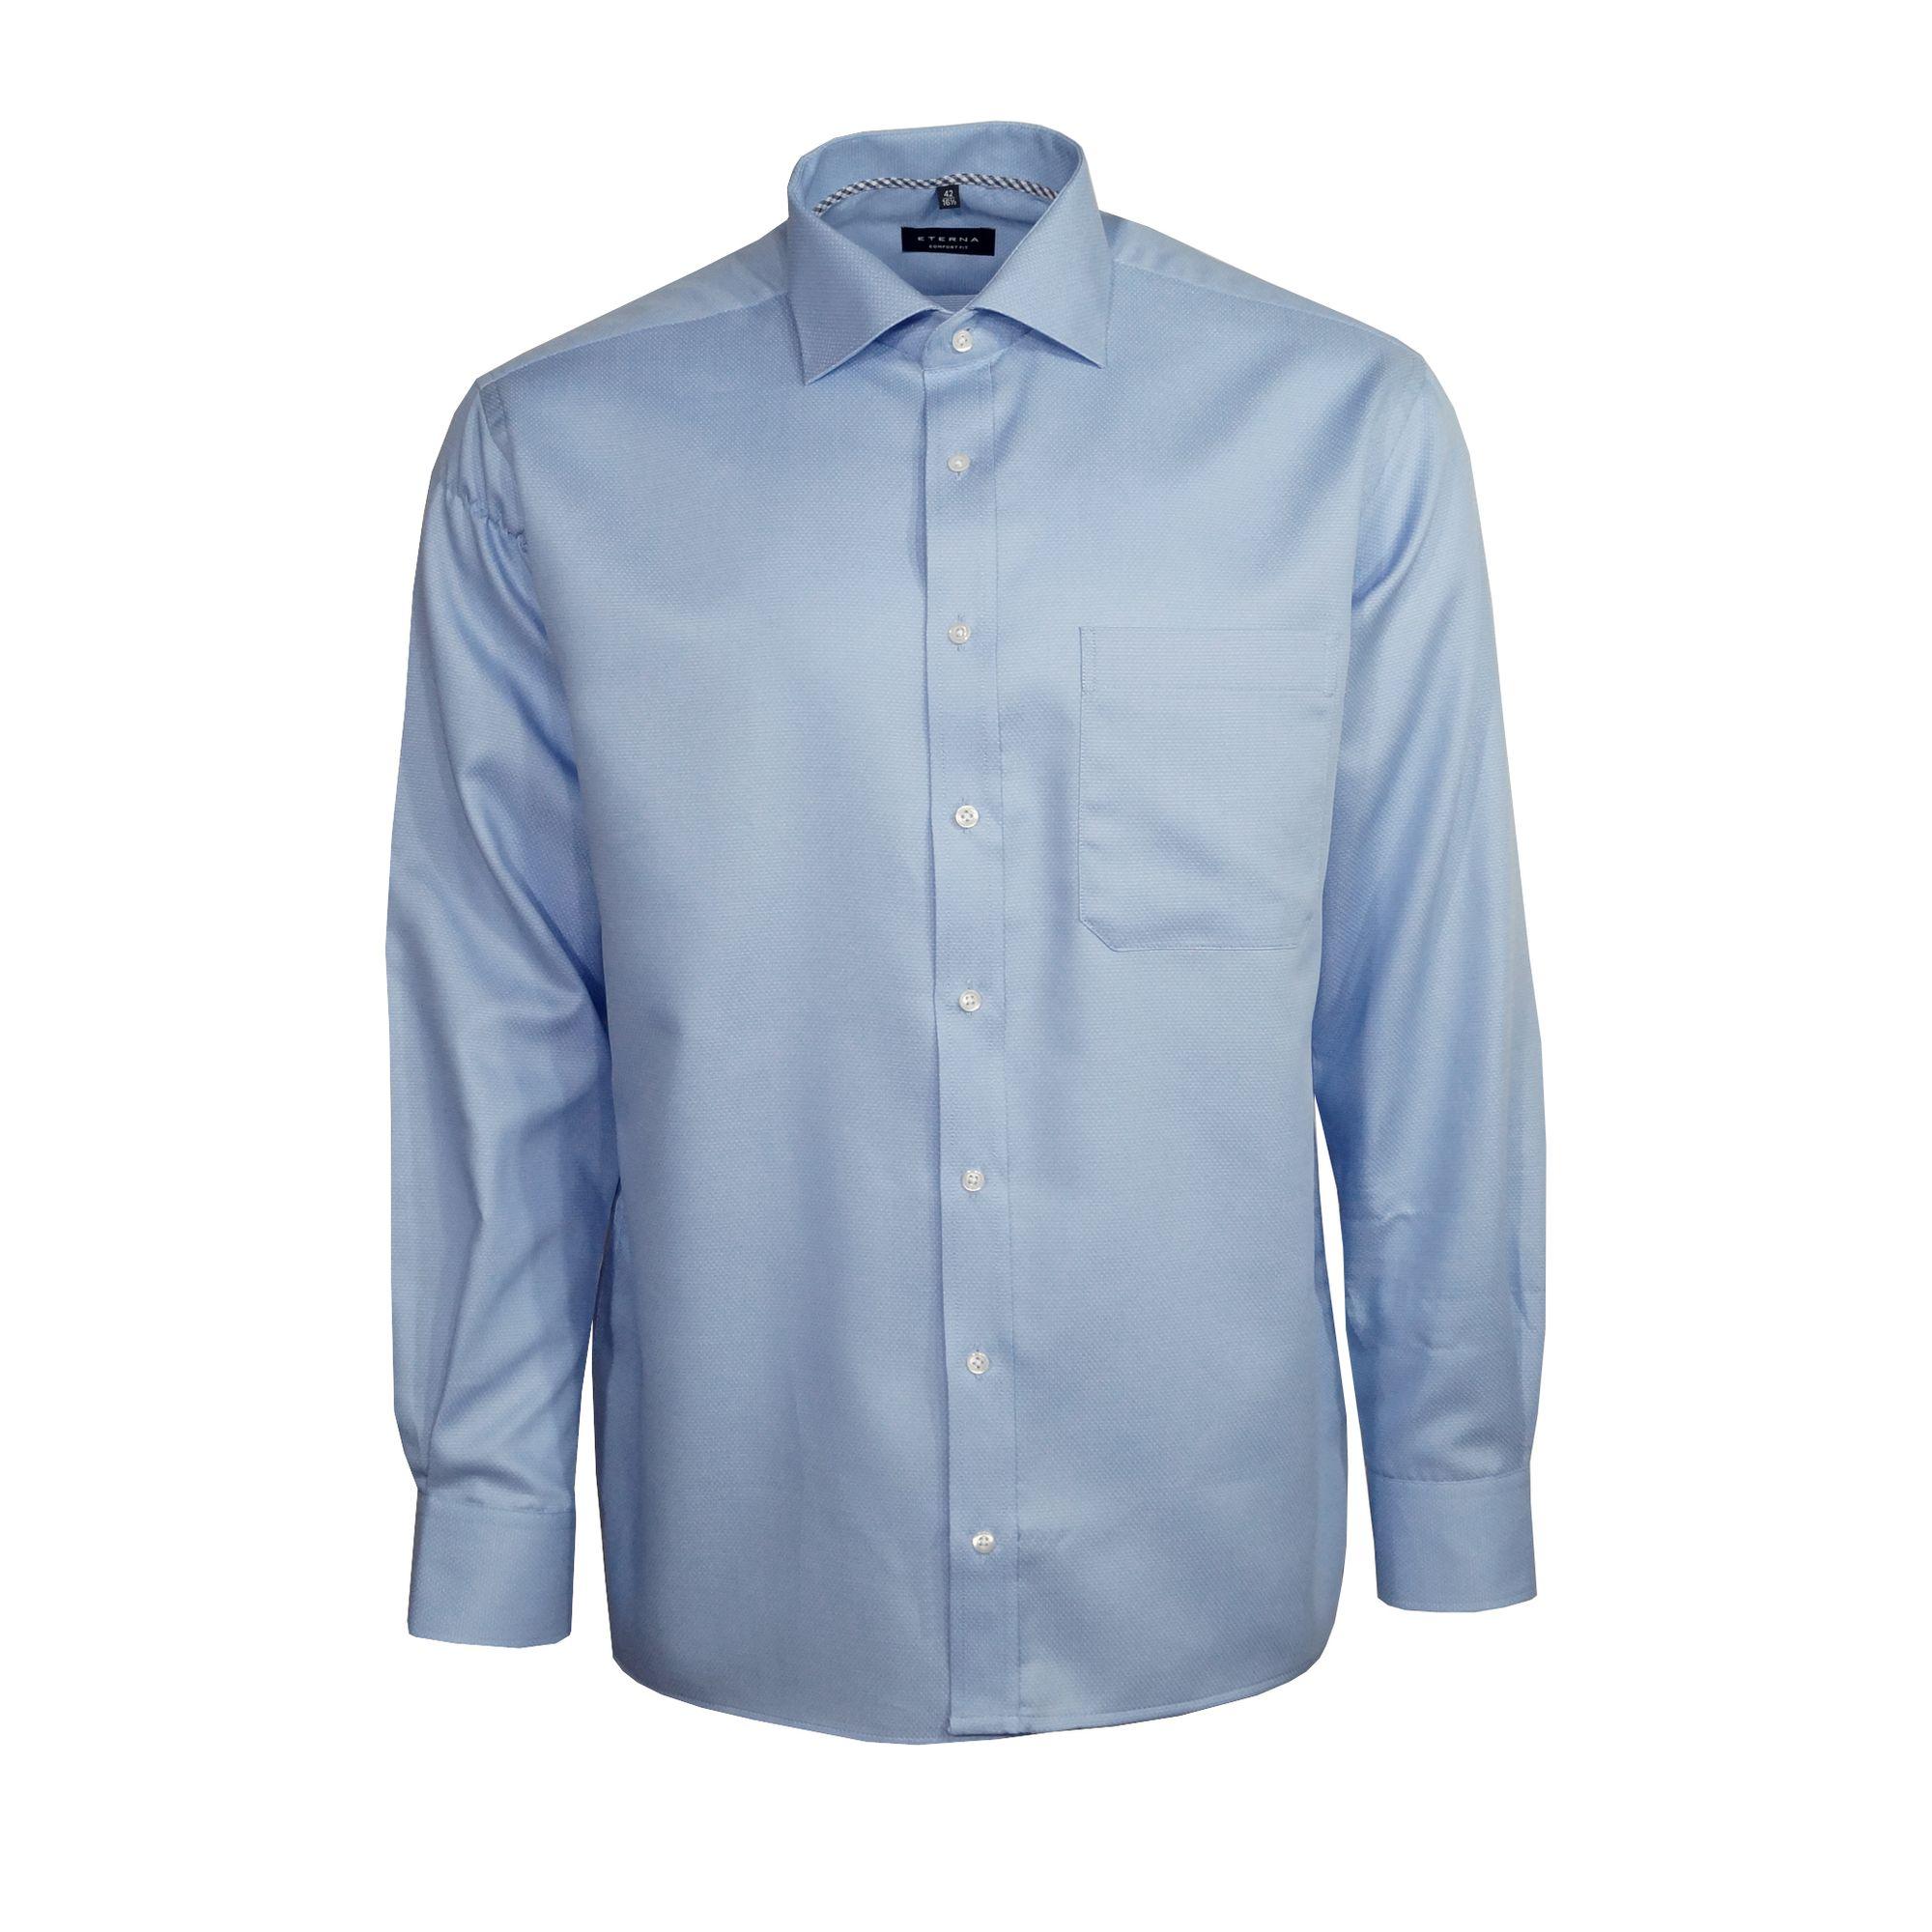 best cheap 8e4f2 95885 Eterna Herren Hemd Langarm Comfort Fit Blau Muster XL/43 8460/12/E187 -  yatego.com